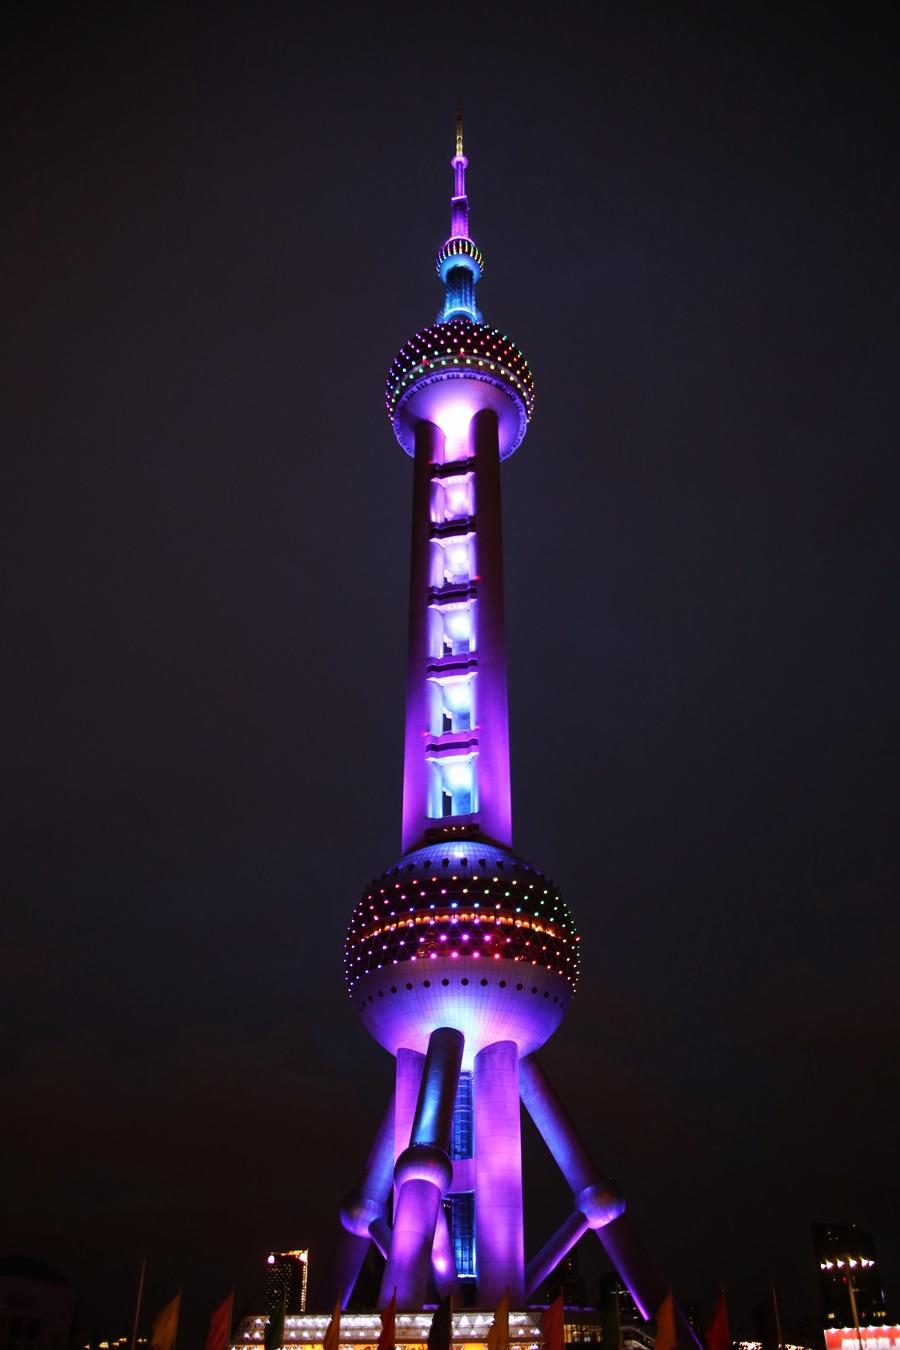 東方明珠電視塔 Oriental Pearl Tower_shanghai (1)